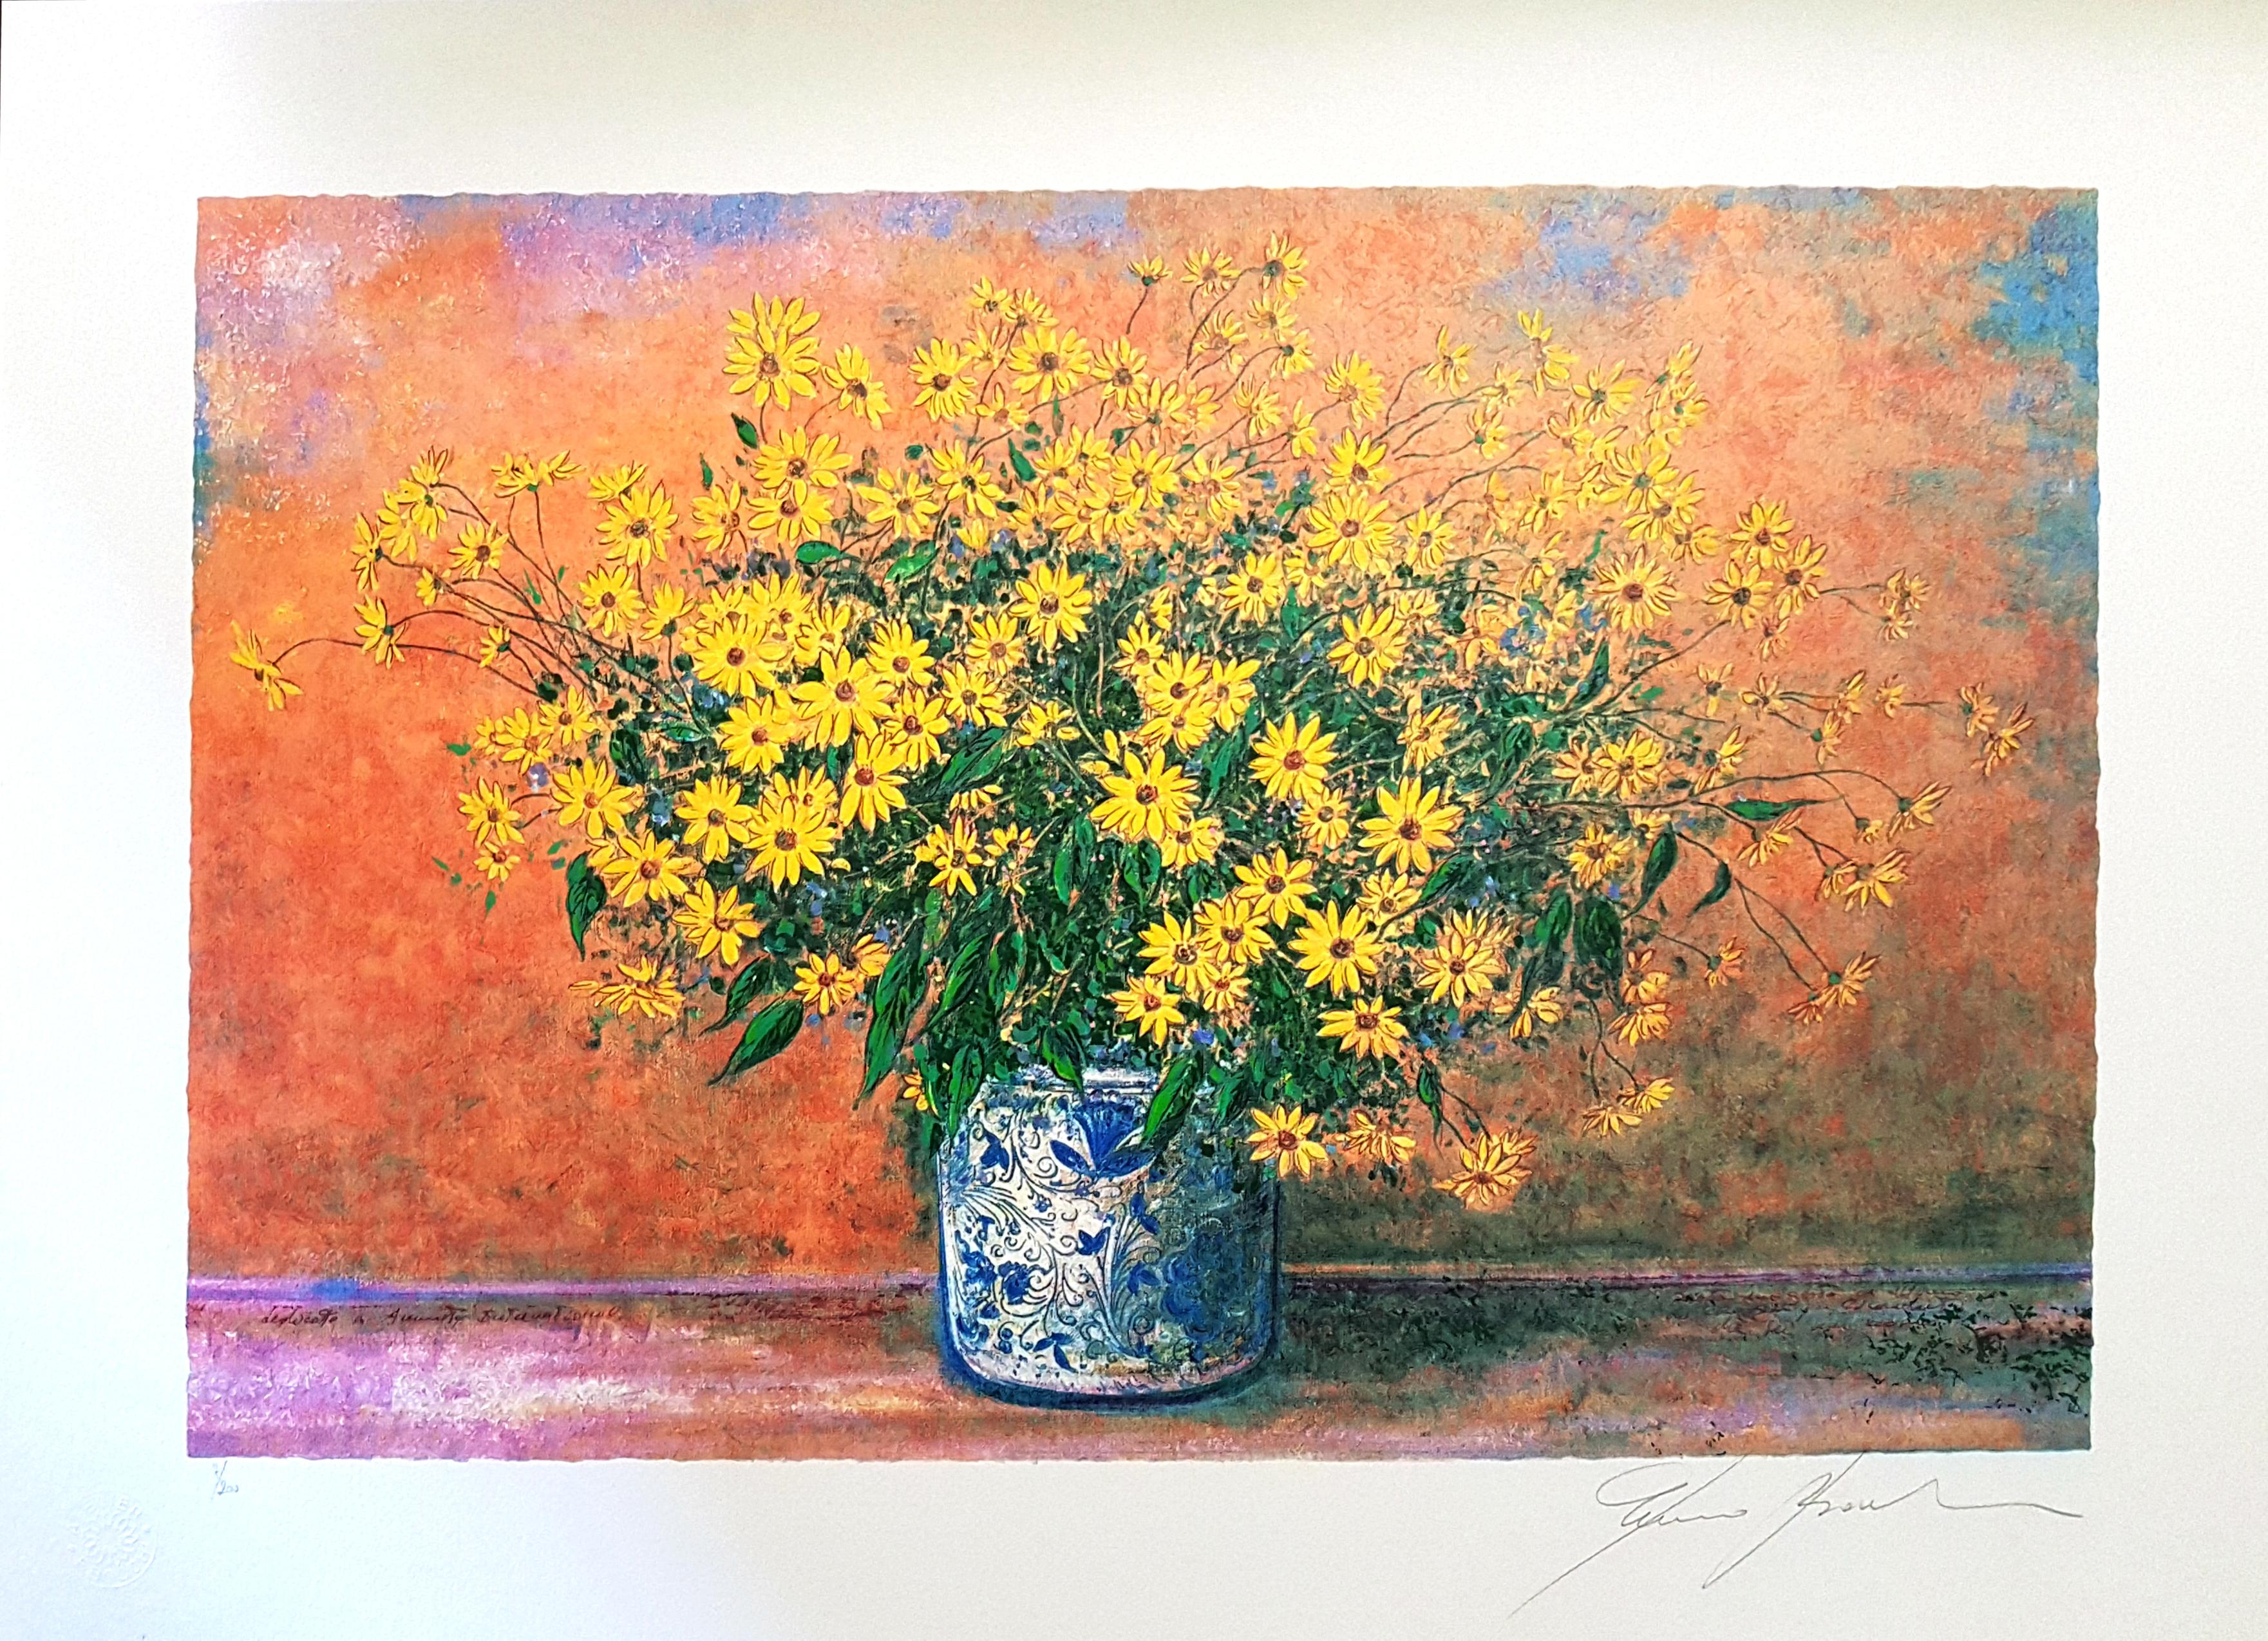 Vase of Jerusalem Artichoke Flowers - Original Screen Print by F. Bocchi